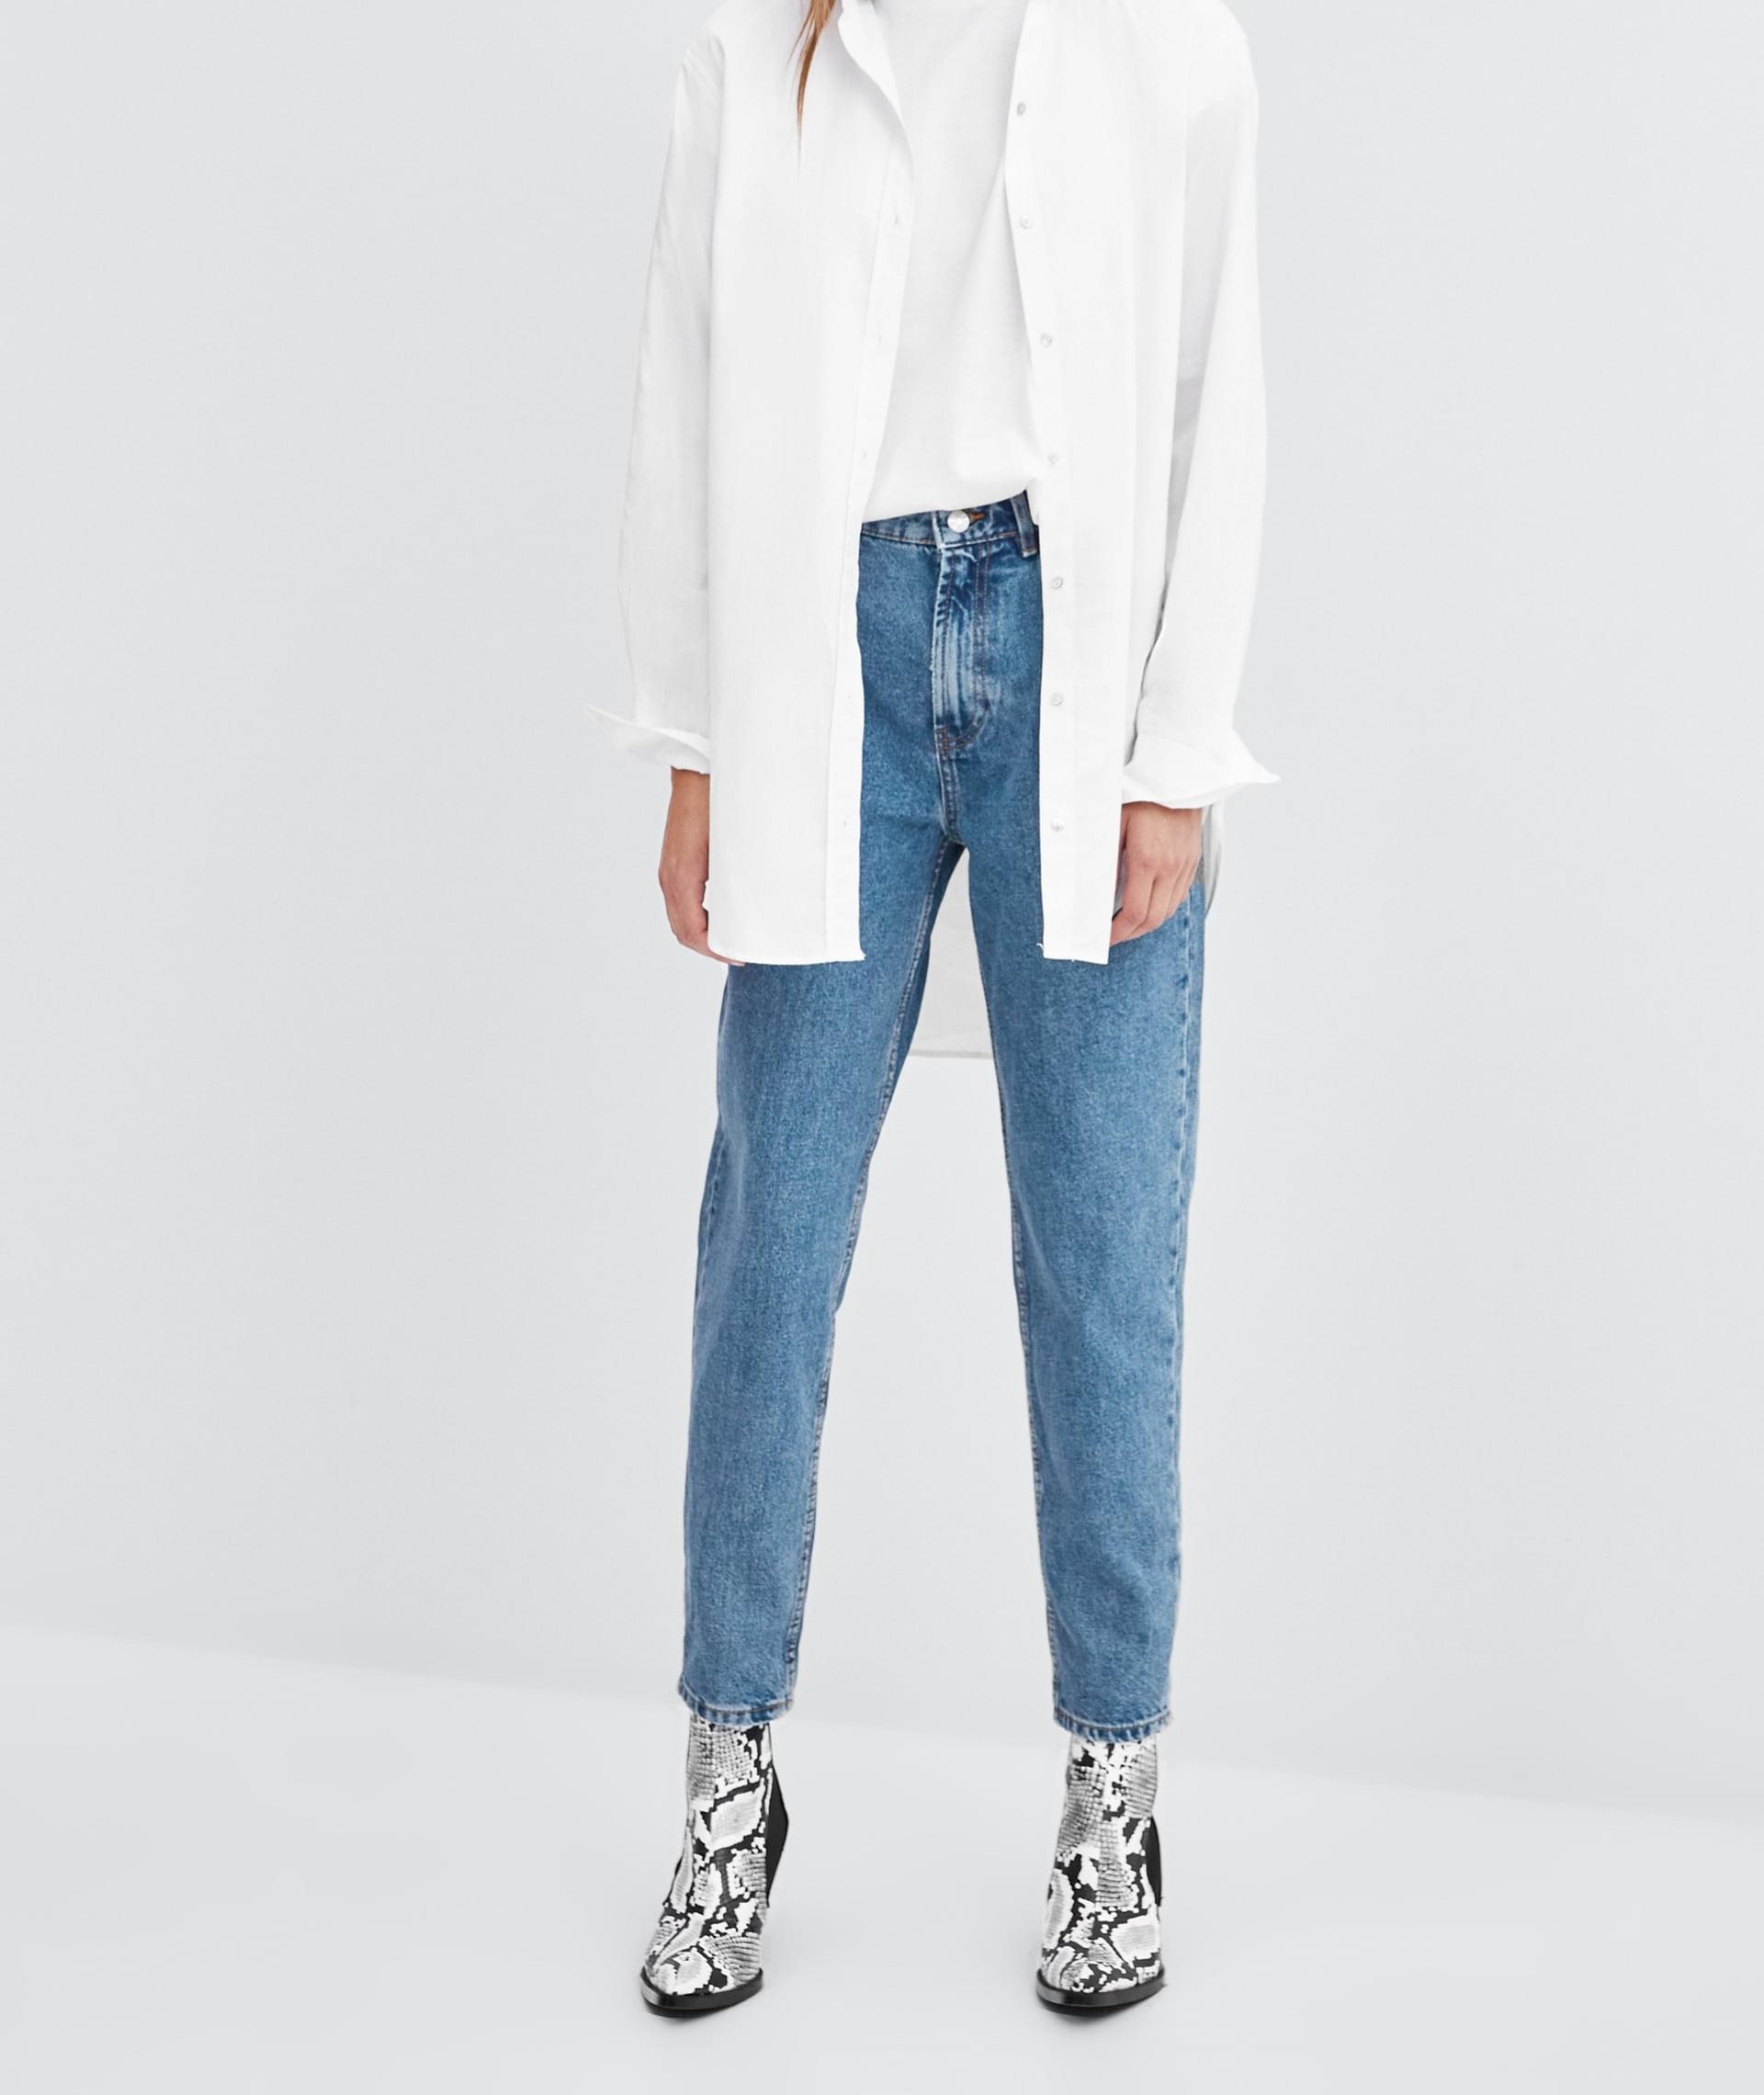 mom jeans zara.jpg